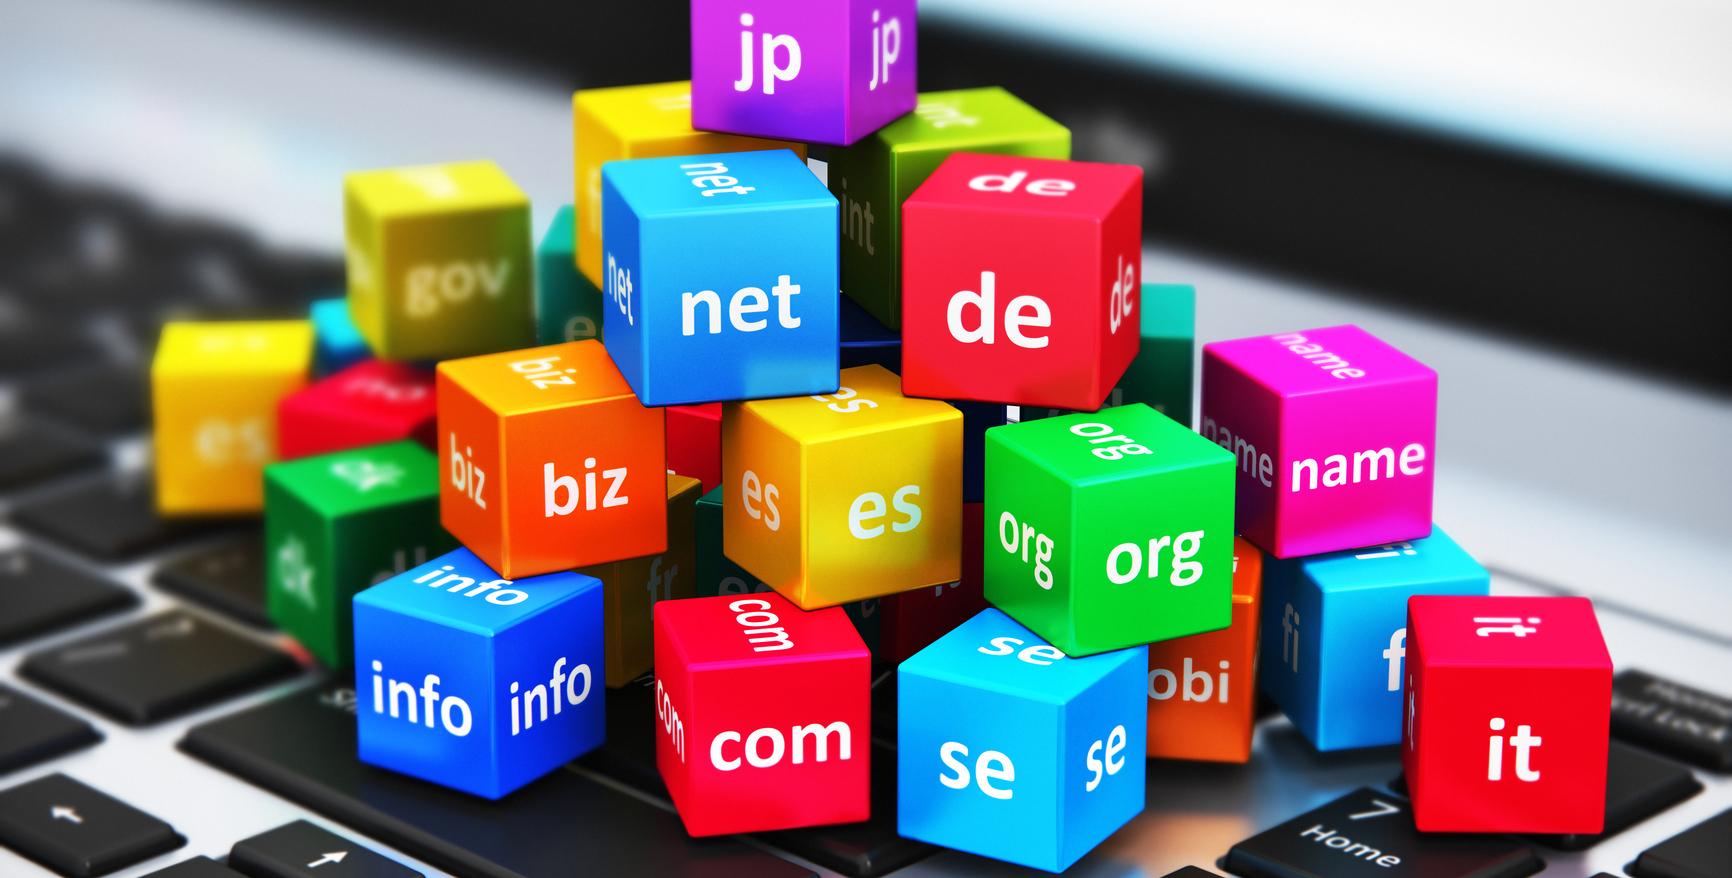 Ini Dia Tips Memilih Nama Domain yang Keren